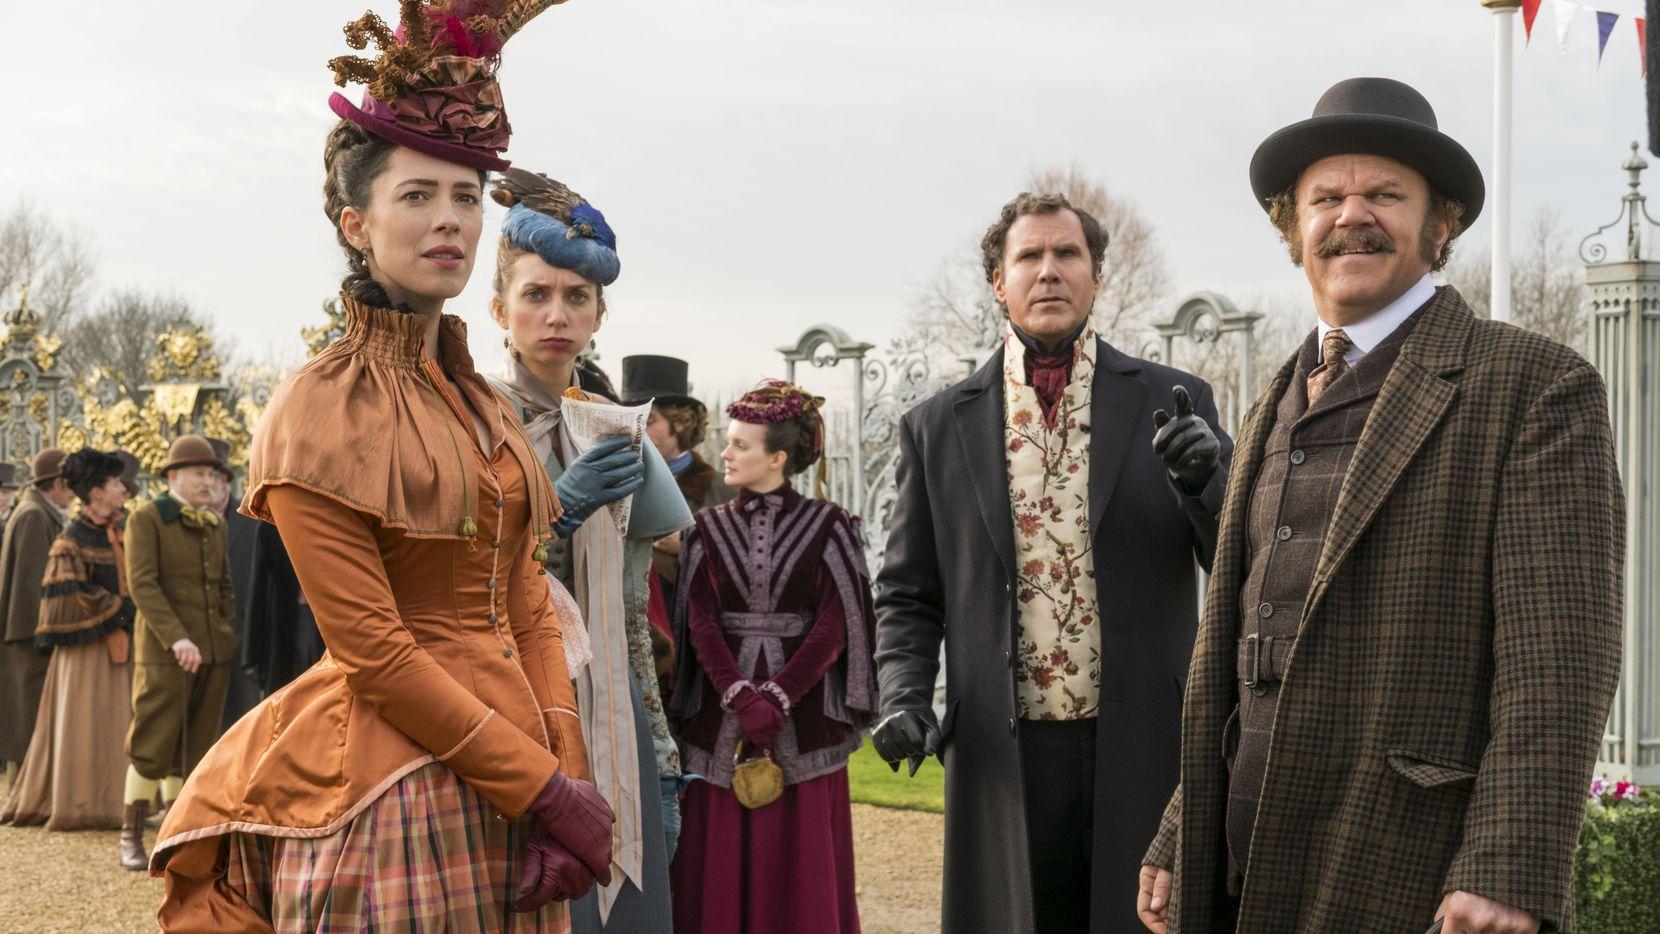 Millie (Lauren Lapkus), Grace (Rebecca Hall), Sherlock Holmes (Will Ferrell), y Watson (John C. Reilly).(COLUMBIA PICTURES)